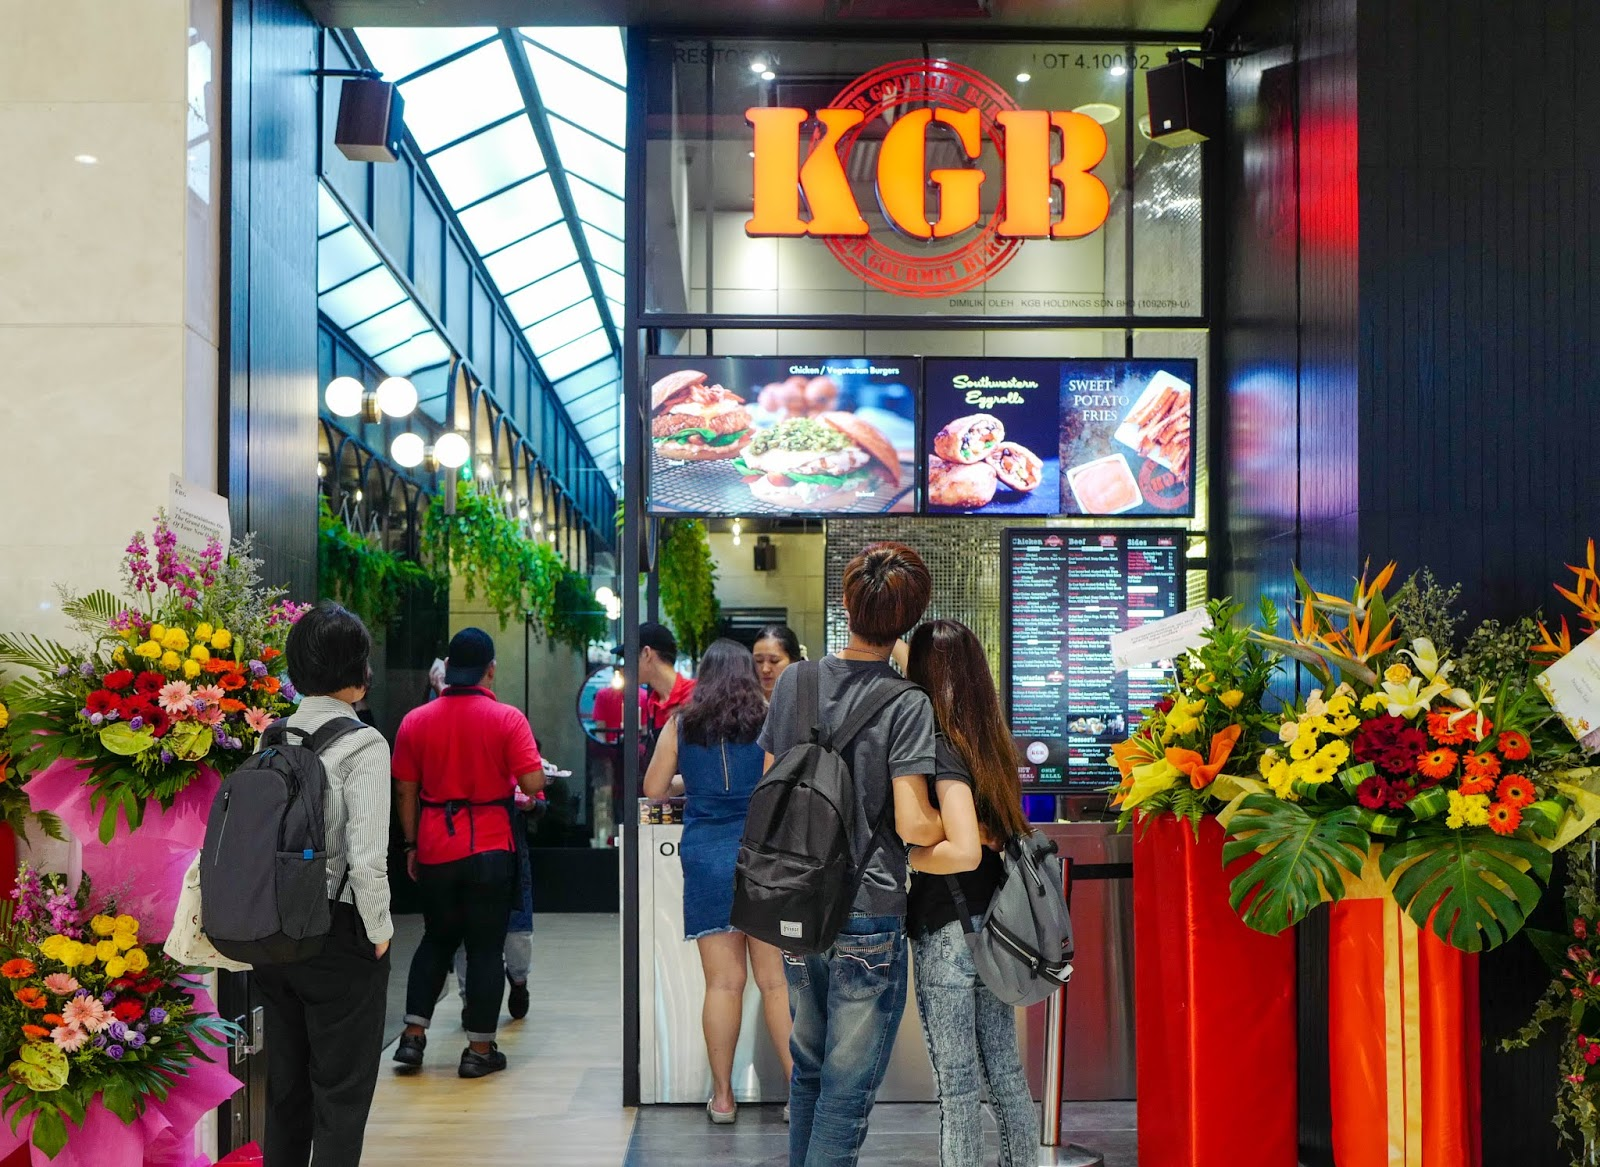 kgb: killer gourmet burgers, pavilion kl